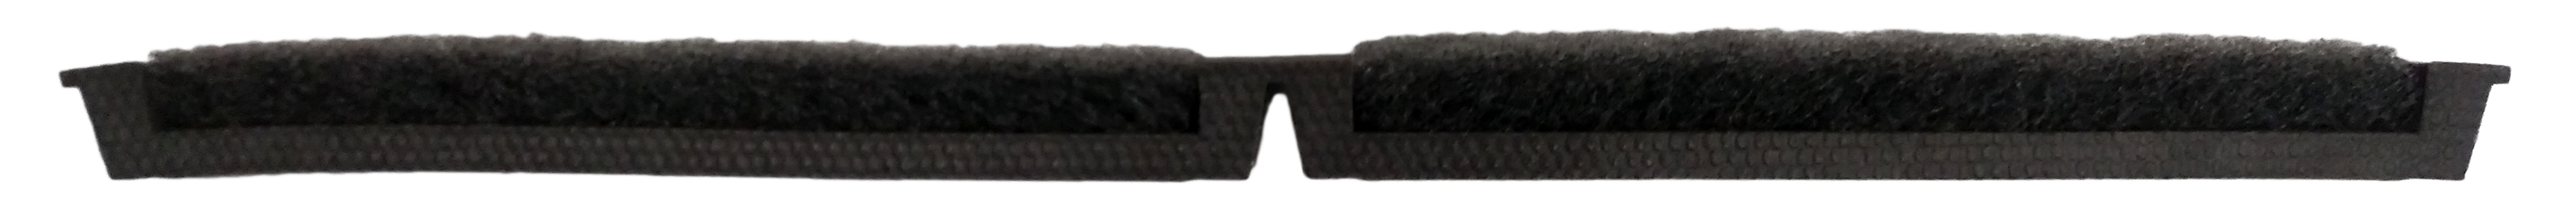 STC1516V - SNAP-TITE 1.5 16'' VENTED CLOSURE